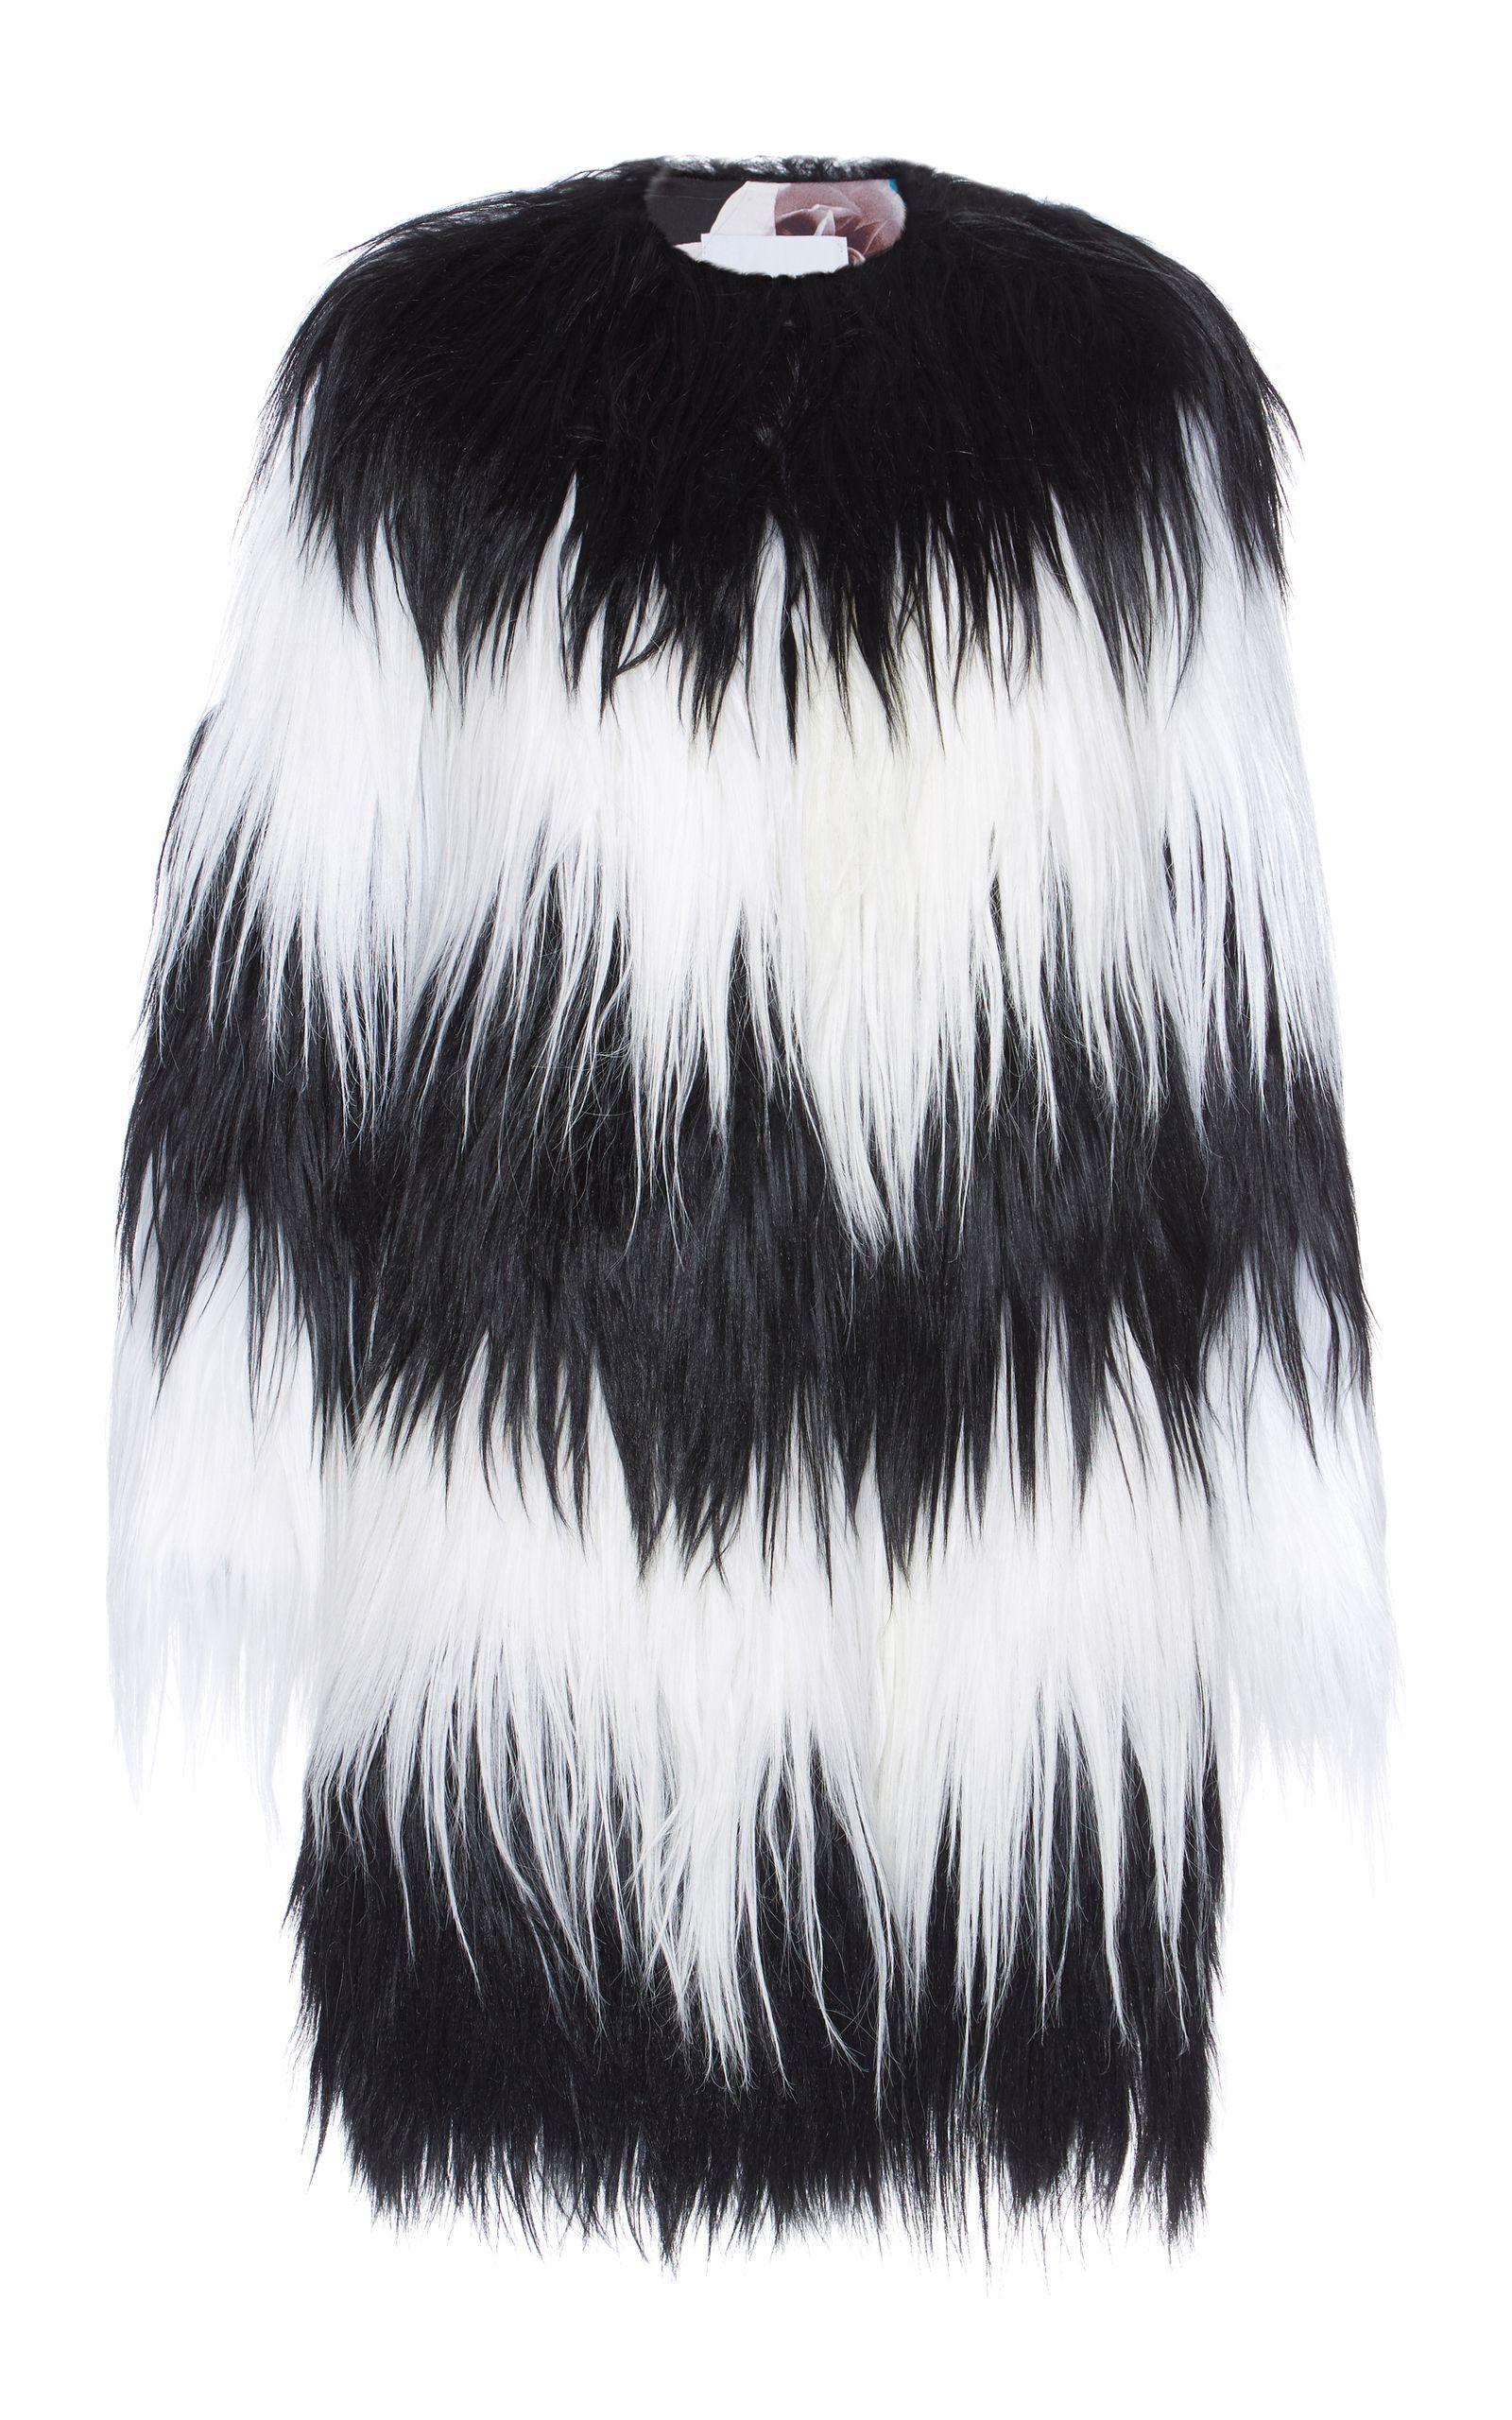 b5e47580ee0 Two Tone Kidassia Fur Coat   LOKI'S LUXURY COATS-please be aware my ...